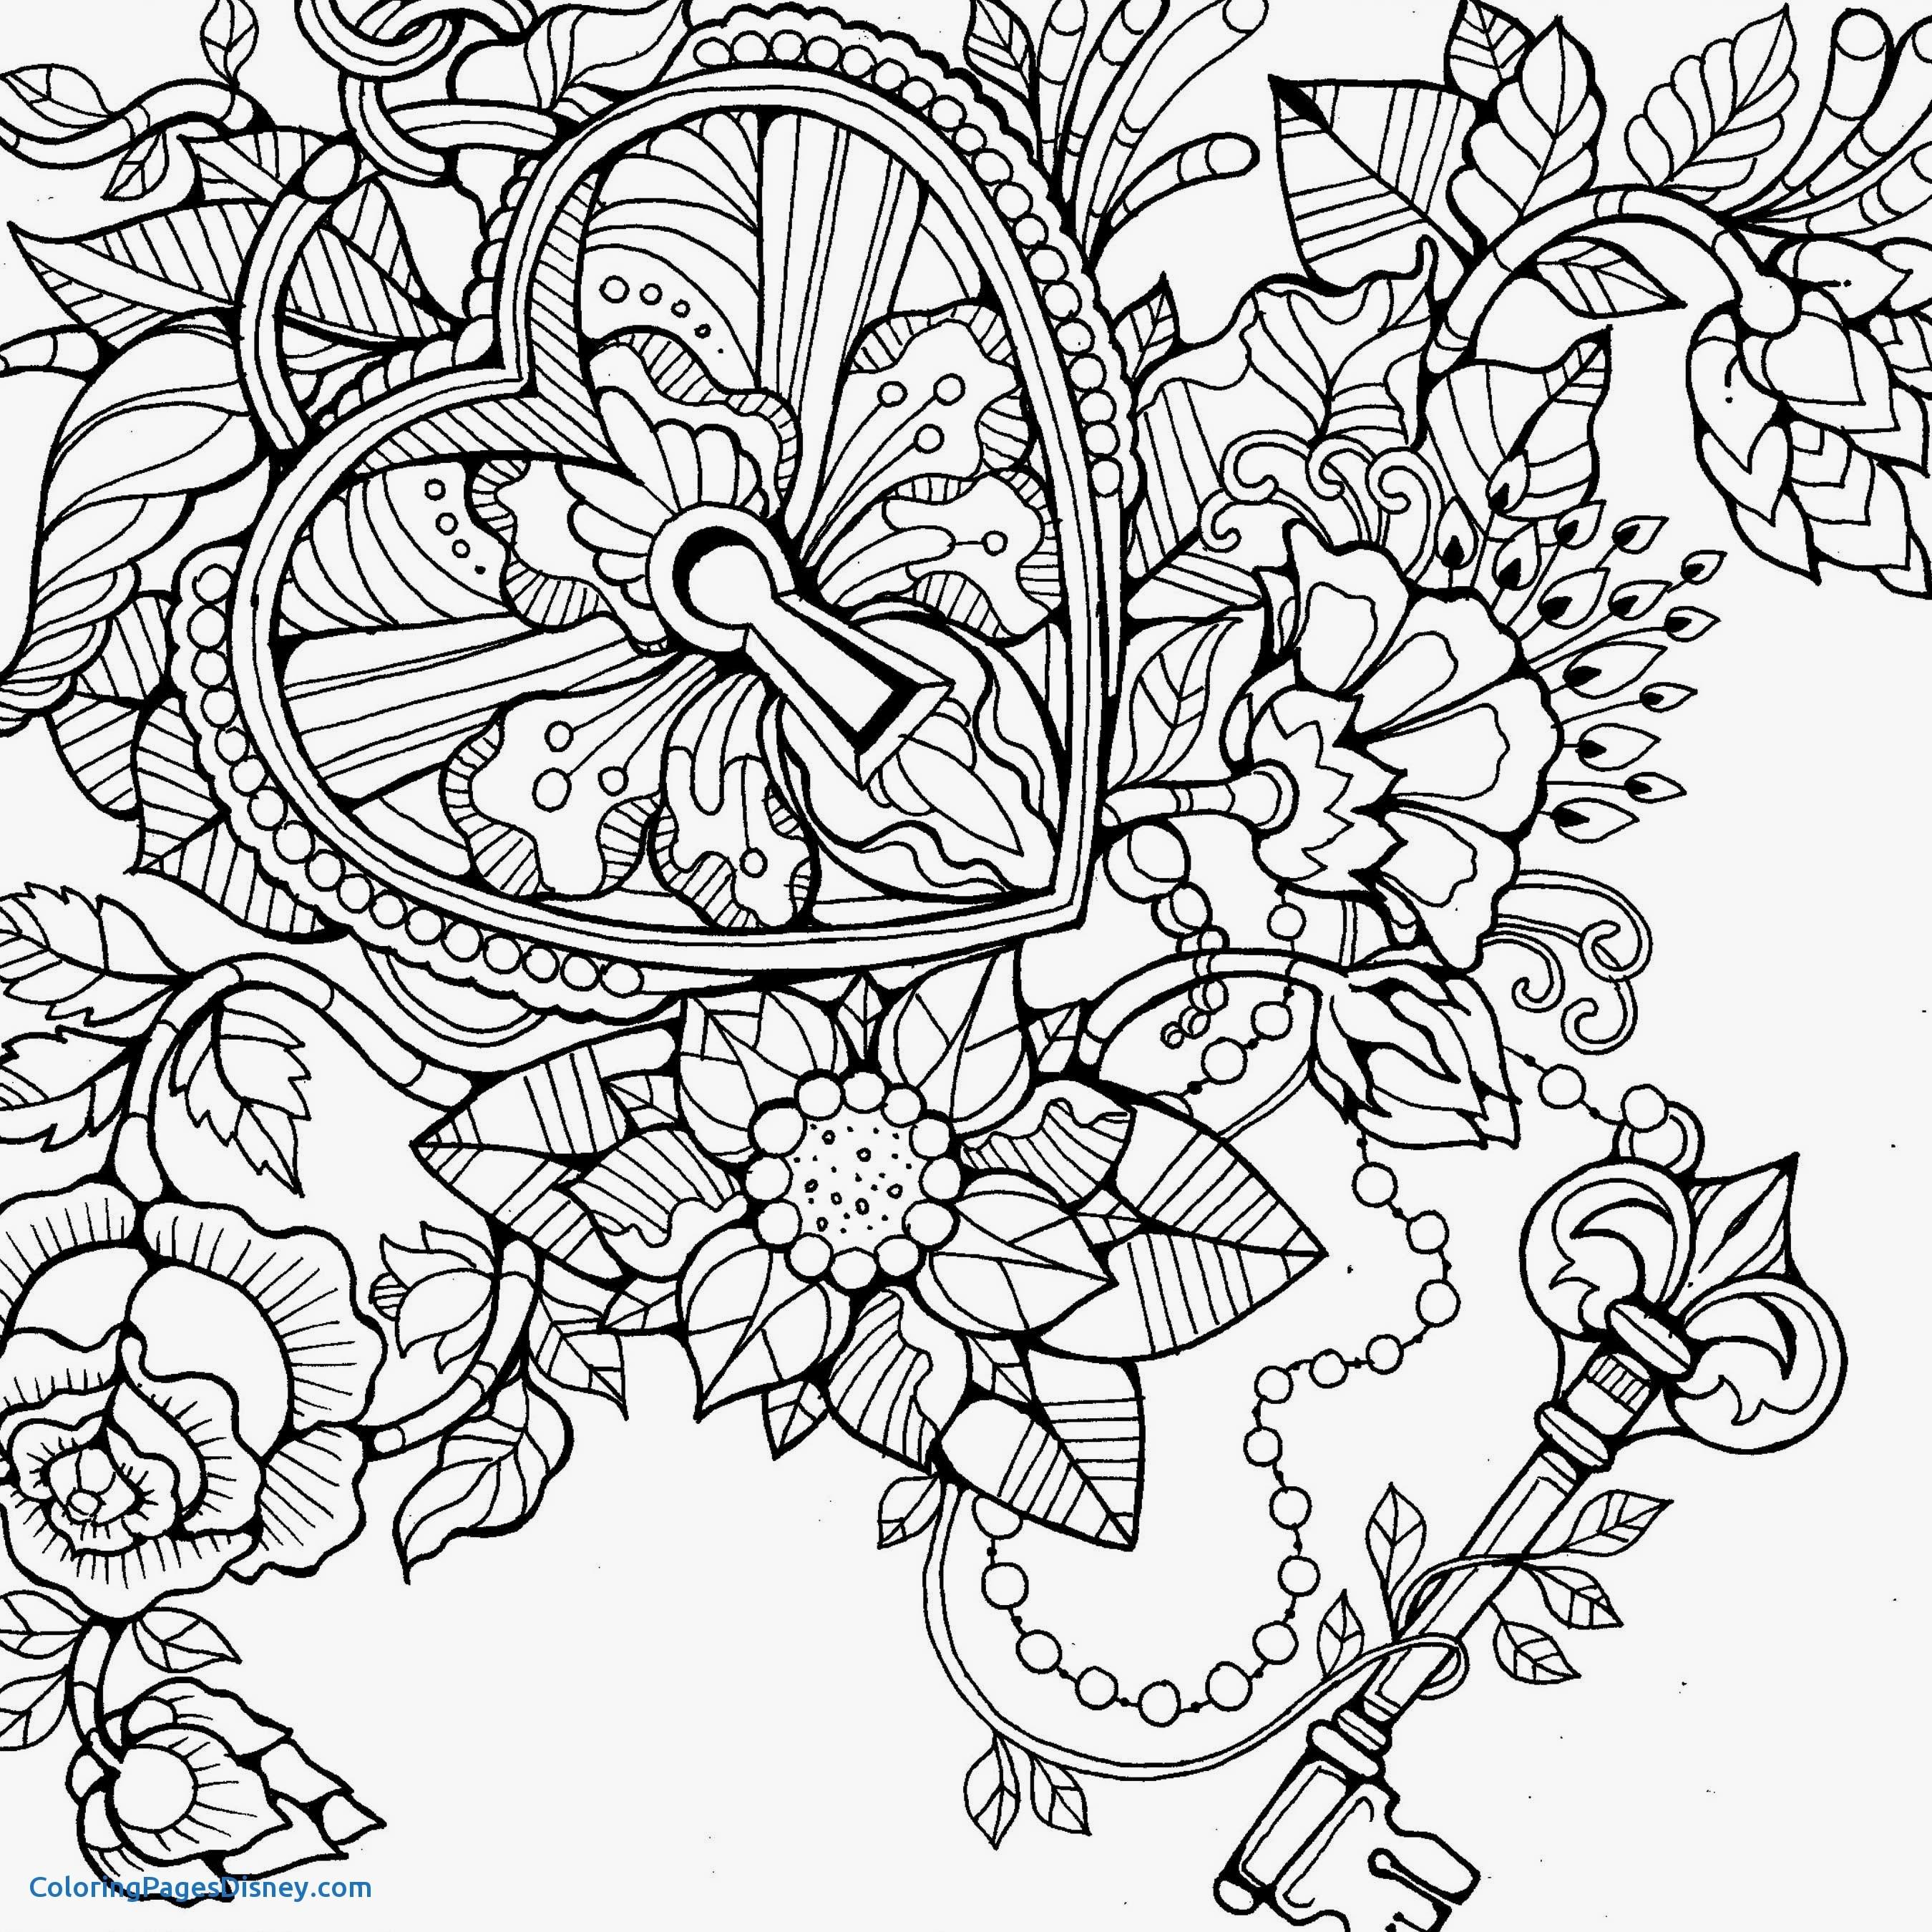 2700x2700 Hydrangea Coloring Pages Unique Colouring Pages